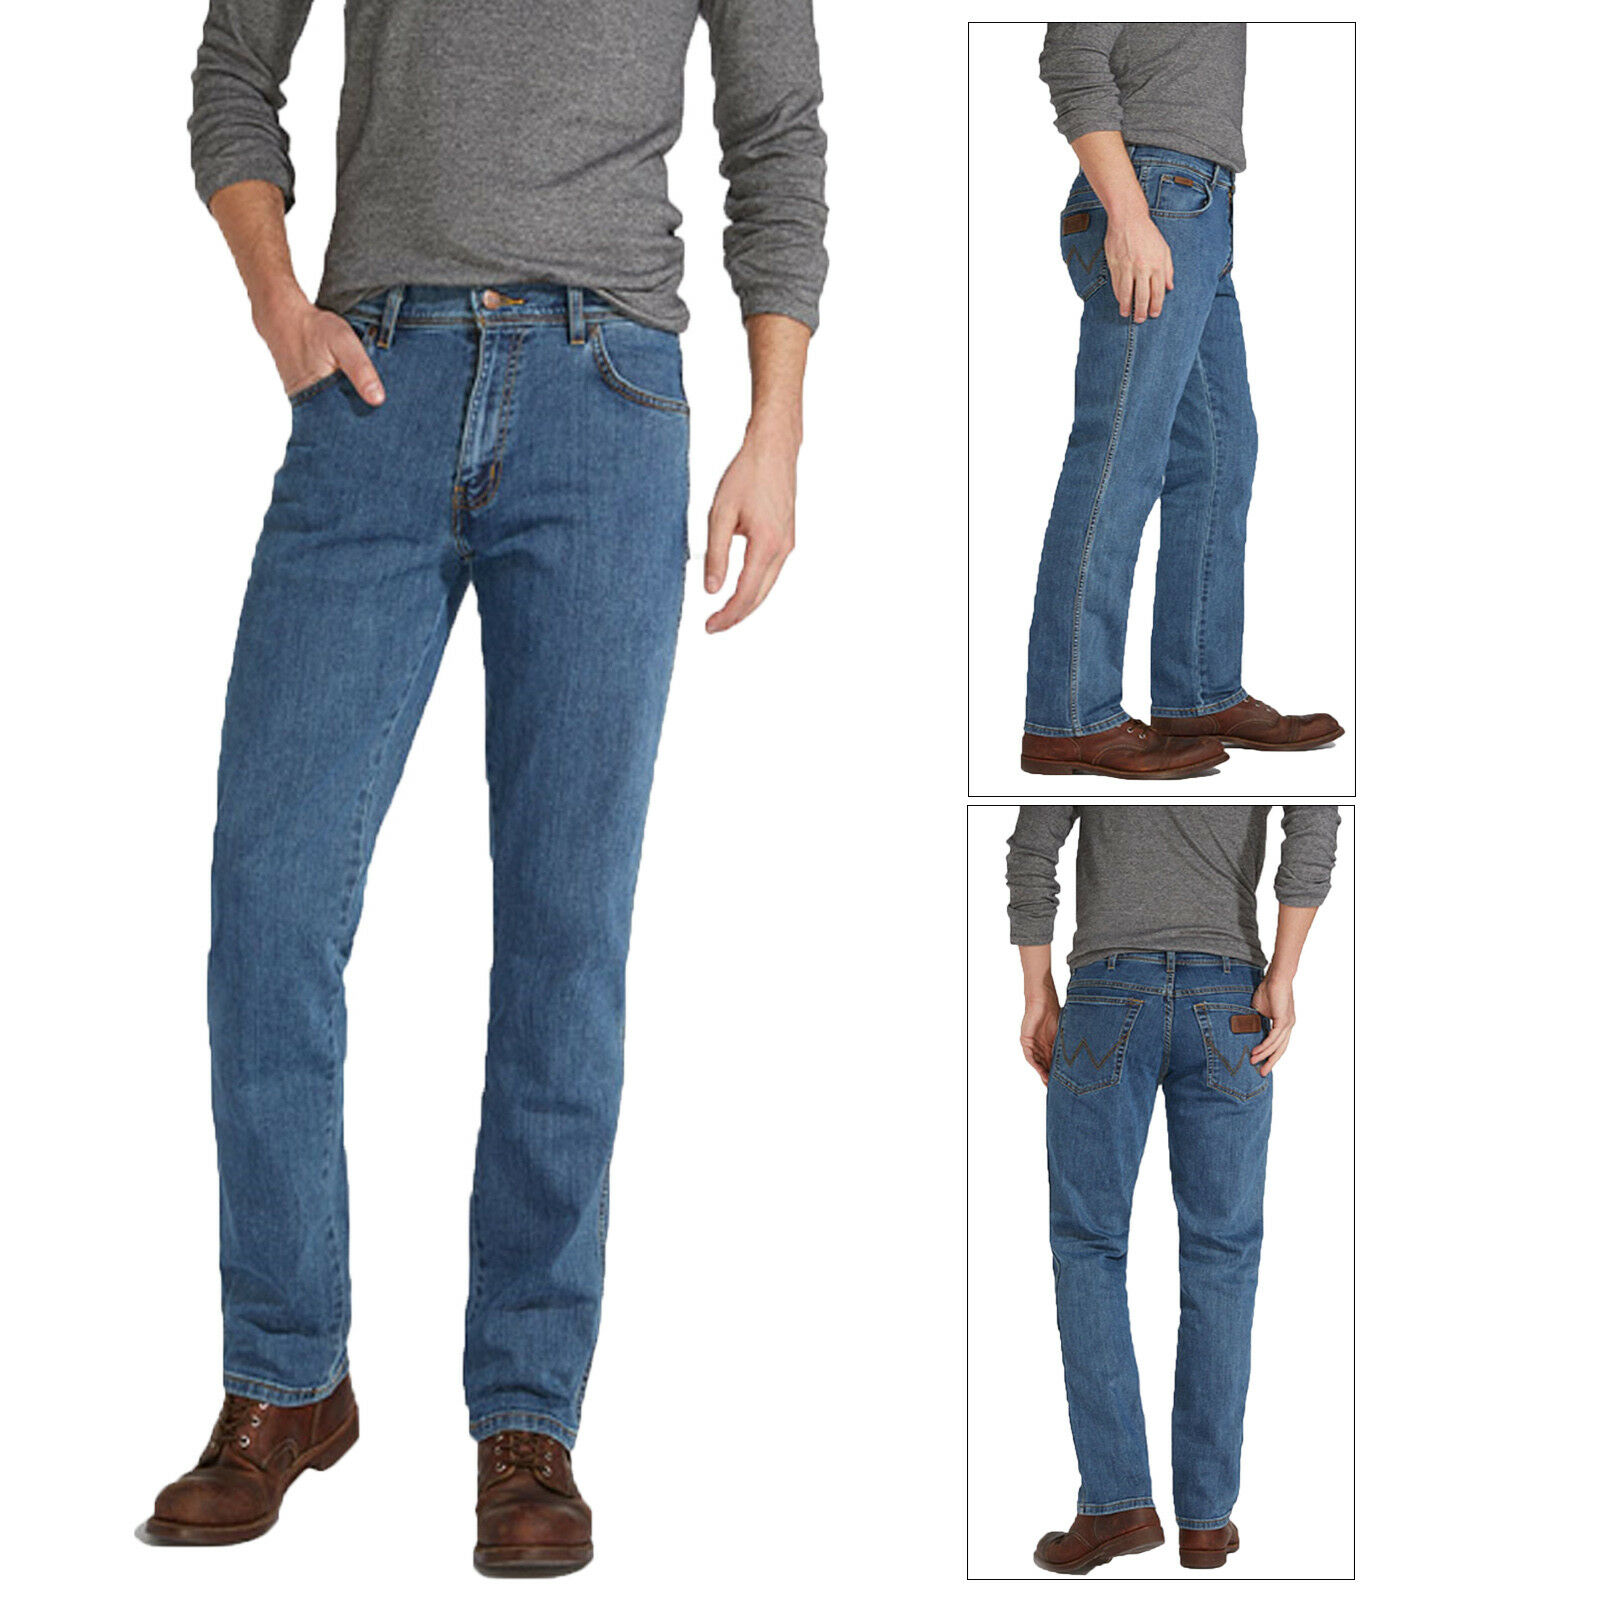 Wrangler Mens Texas Stonewash Iconic Designer Stretch Fit Pants Denim Jeans